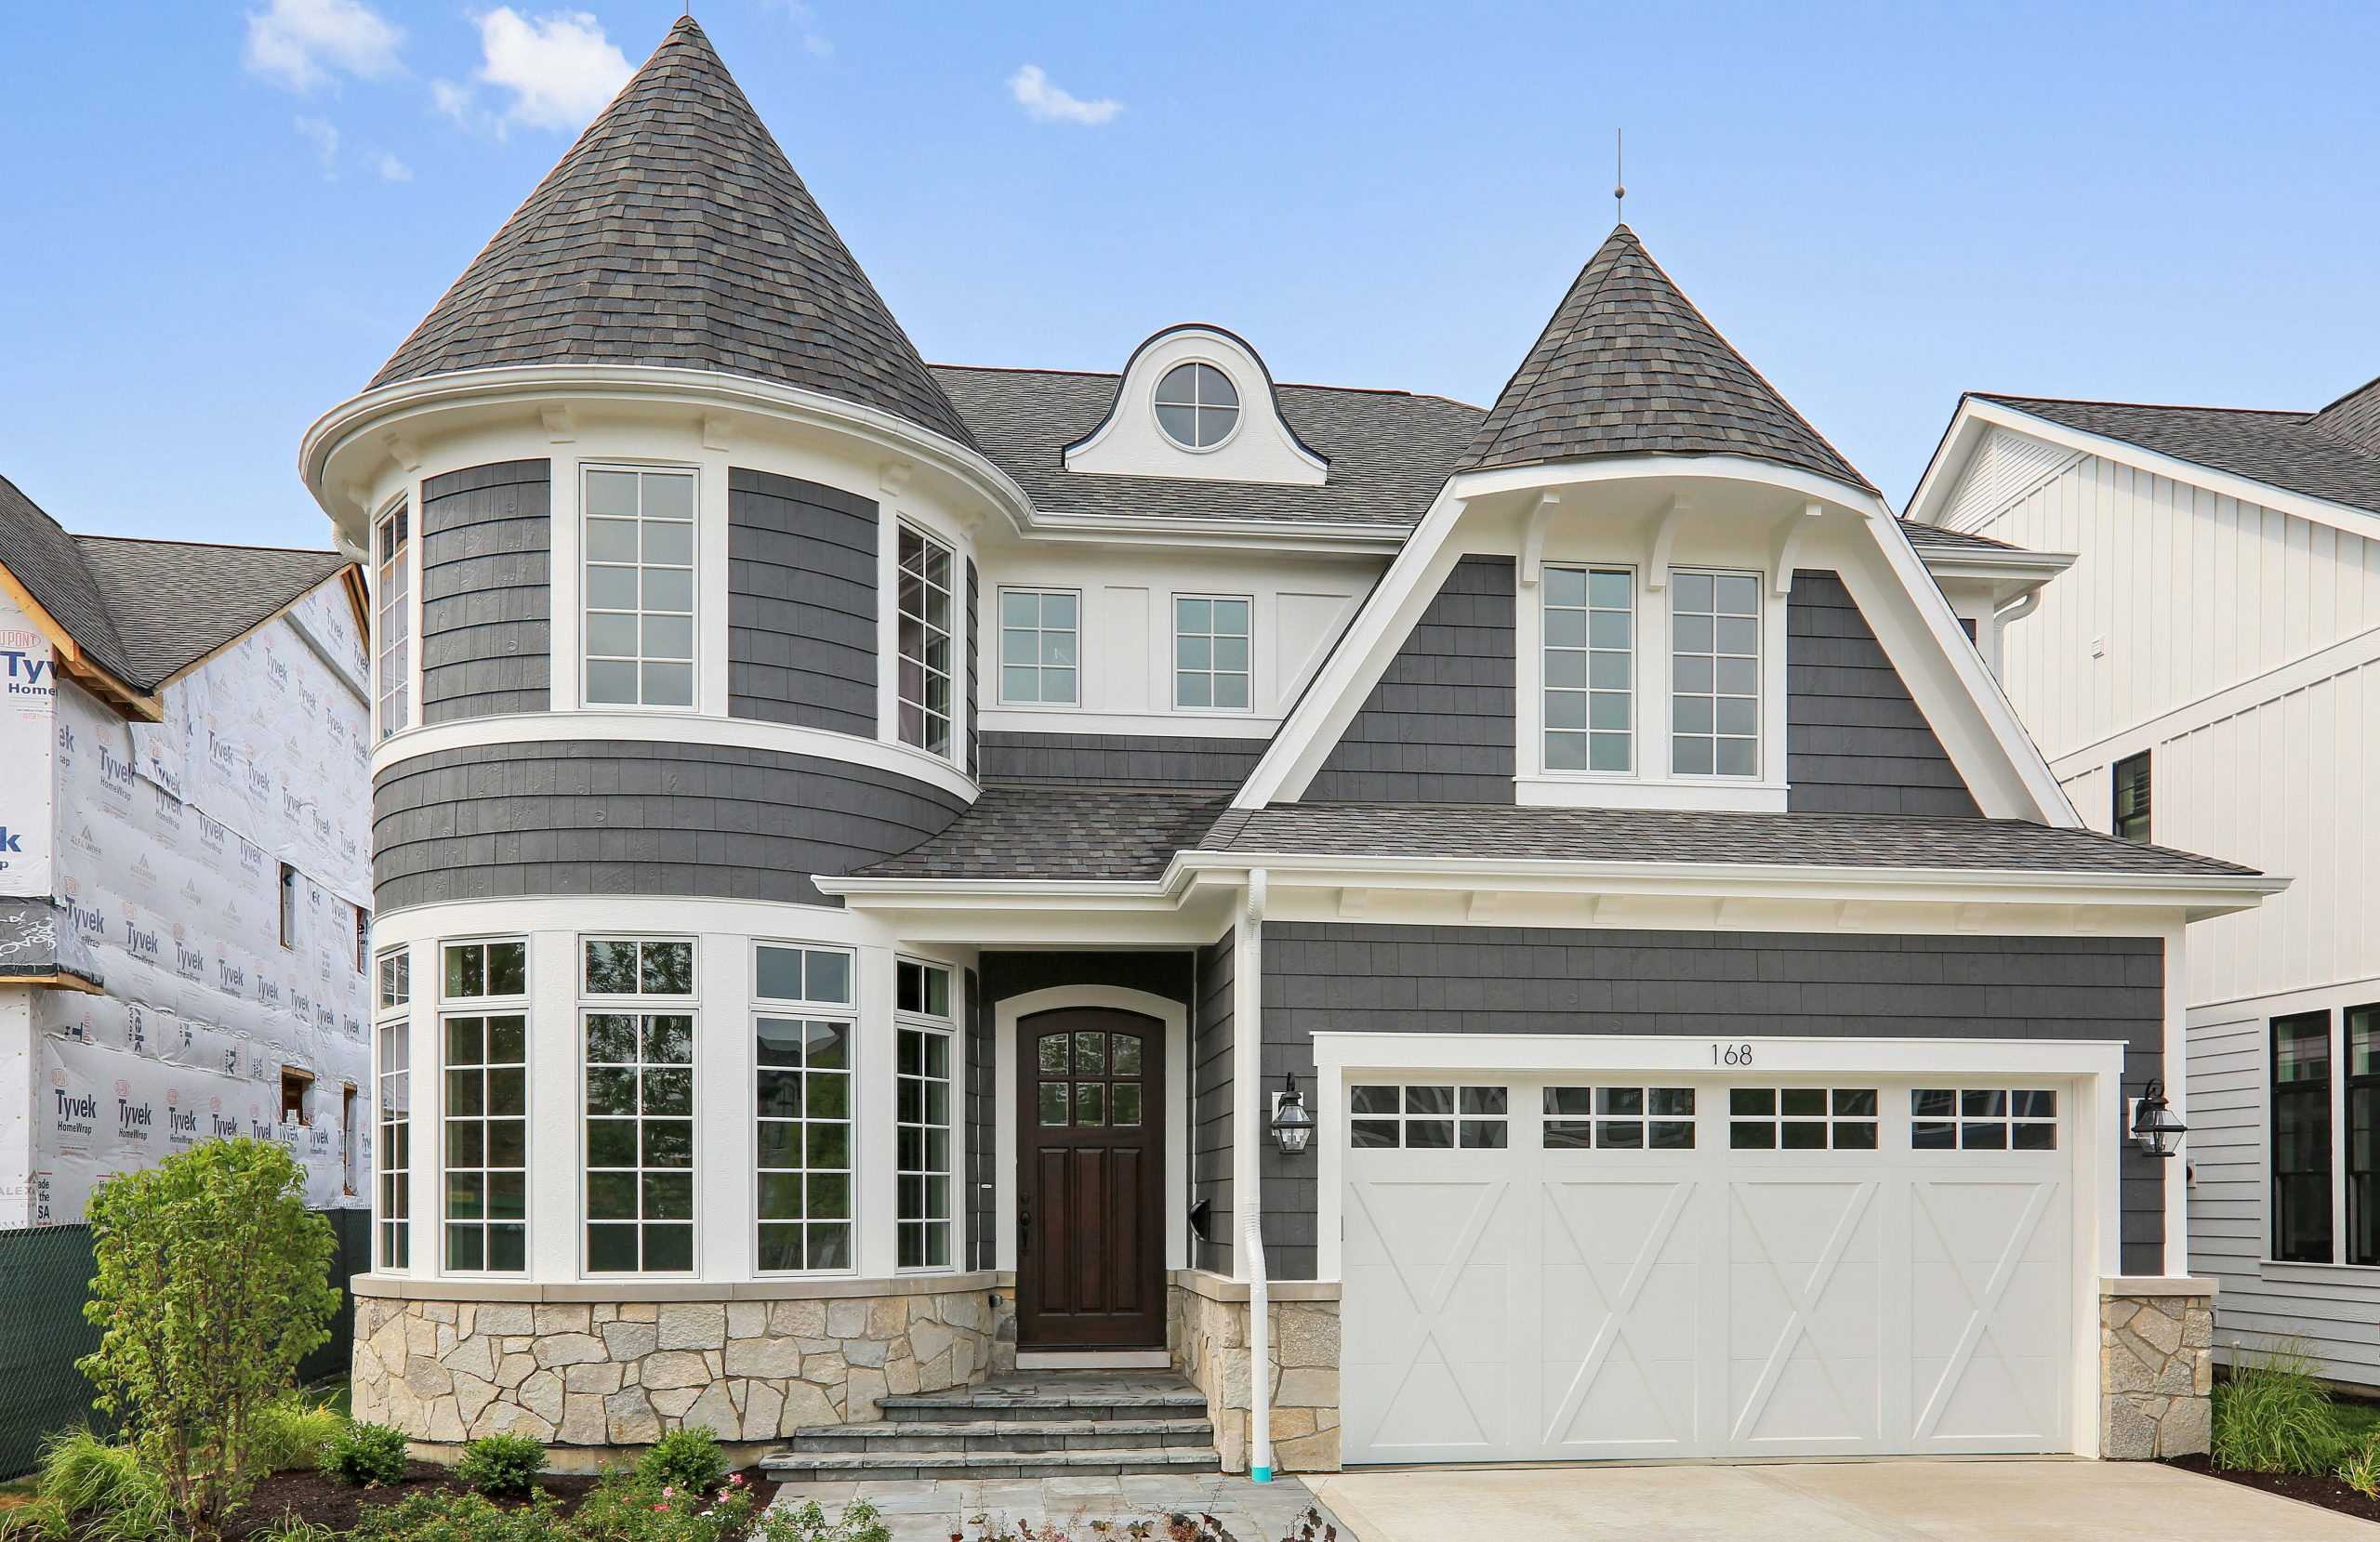 Blue gray siding colors with dark brown front door. Azek wall paneling. White garage door. Light tan stone veneer siding. Dark gray shingle roof.